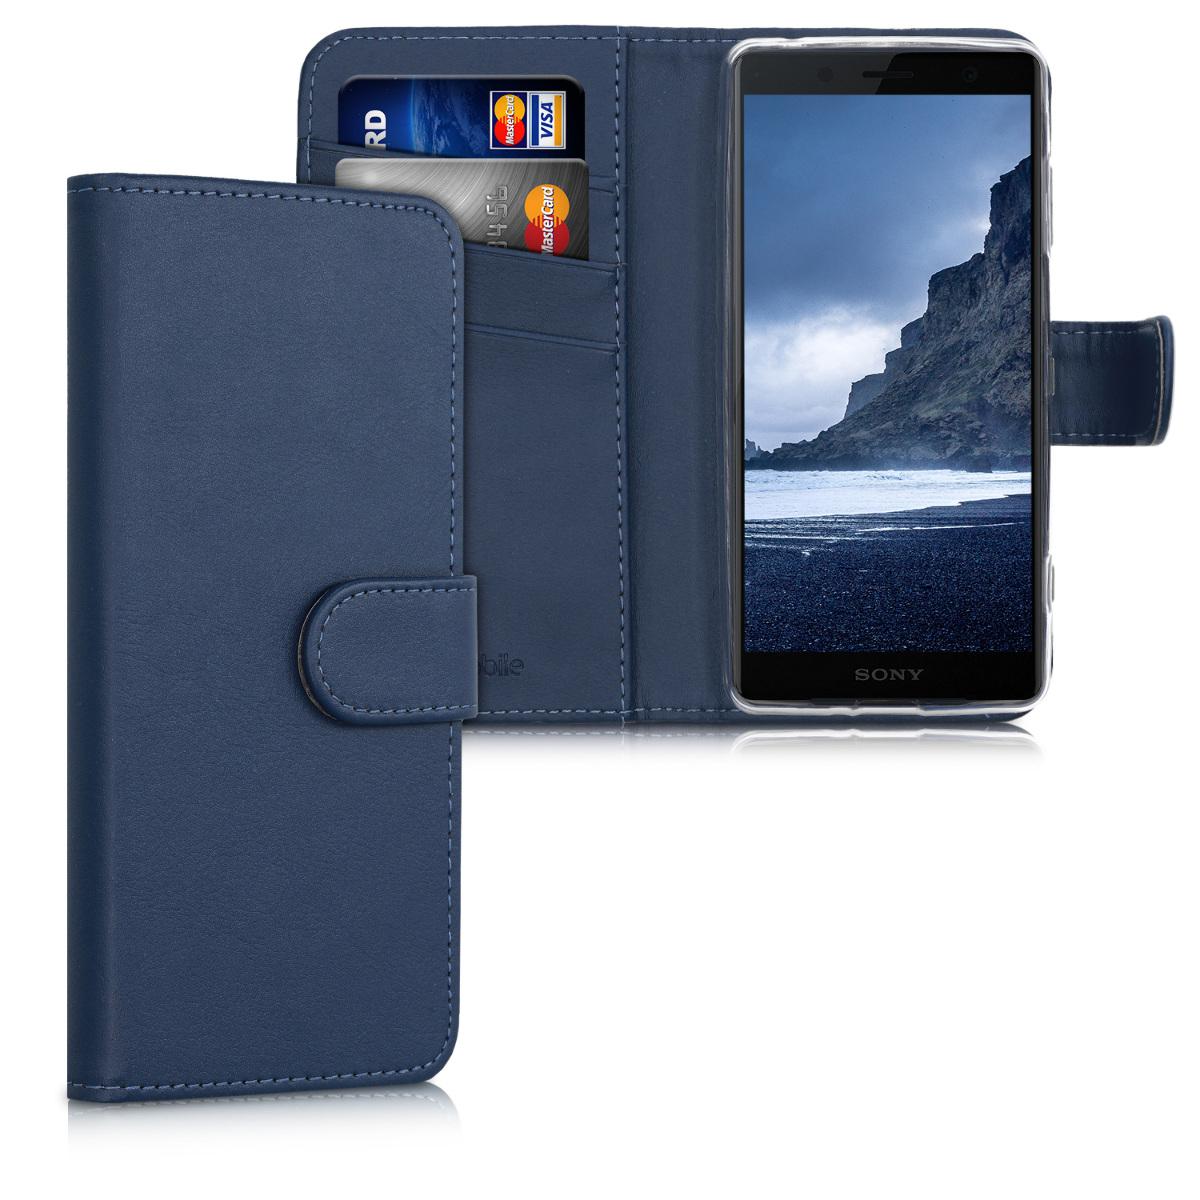 Kožené pouzdro | obal pro Sony Xperia XZ2 Compact - tmavě modré